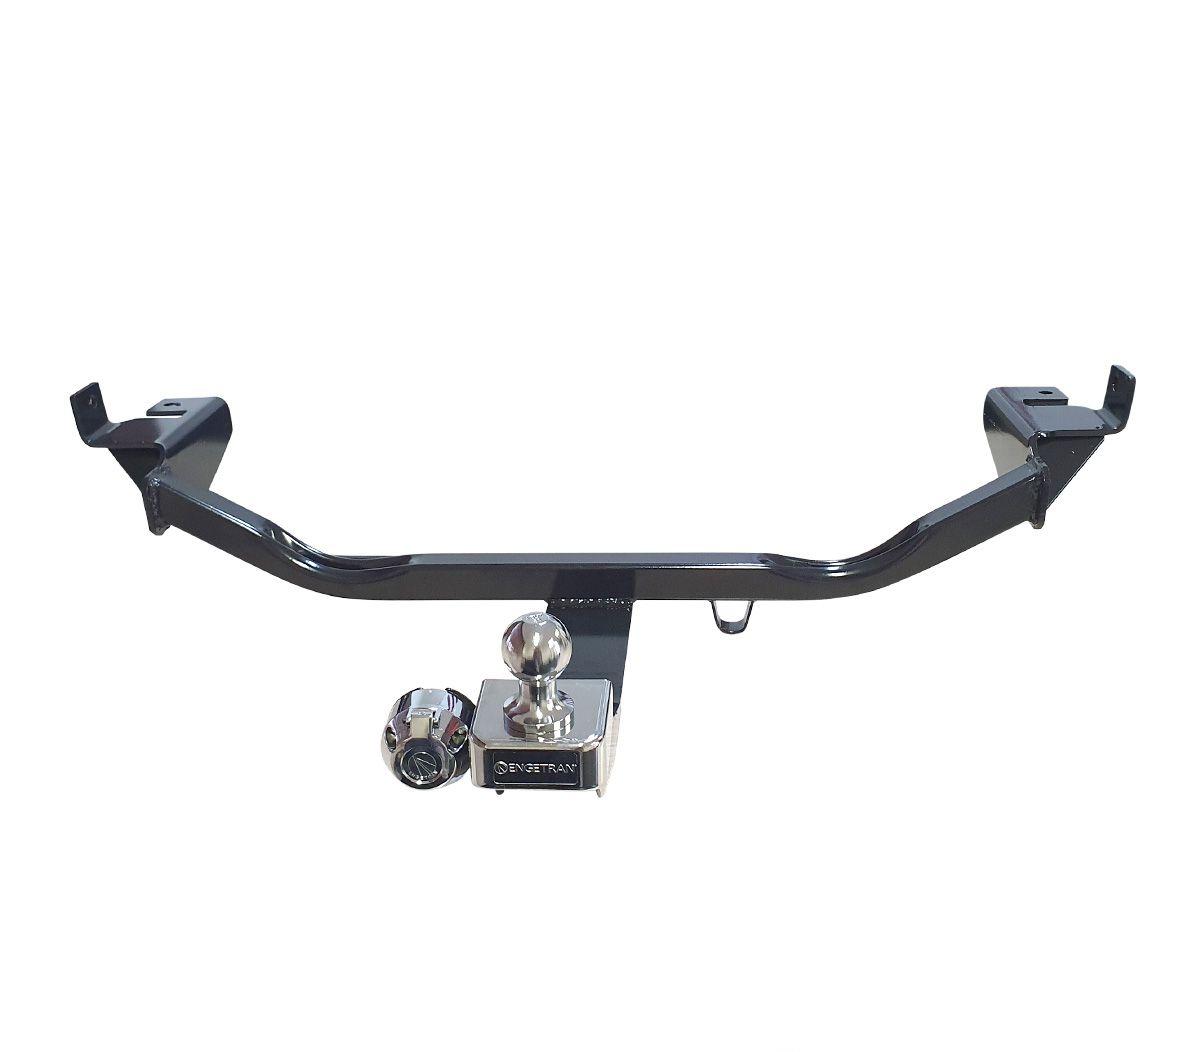 Engate Reboque Chevrolet Onix Hatch 2020 Fixo Engetran ENG-212067